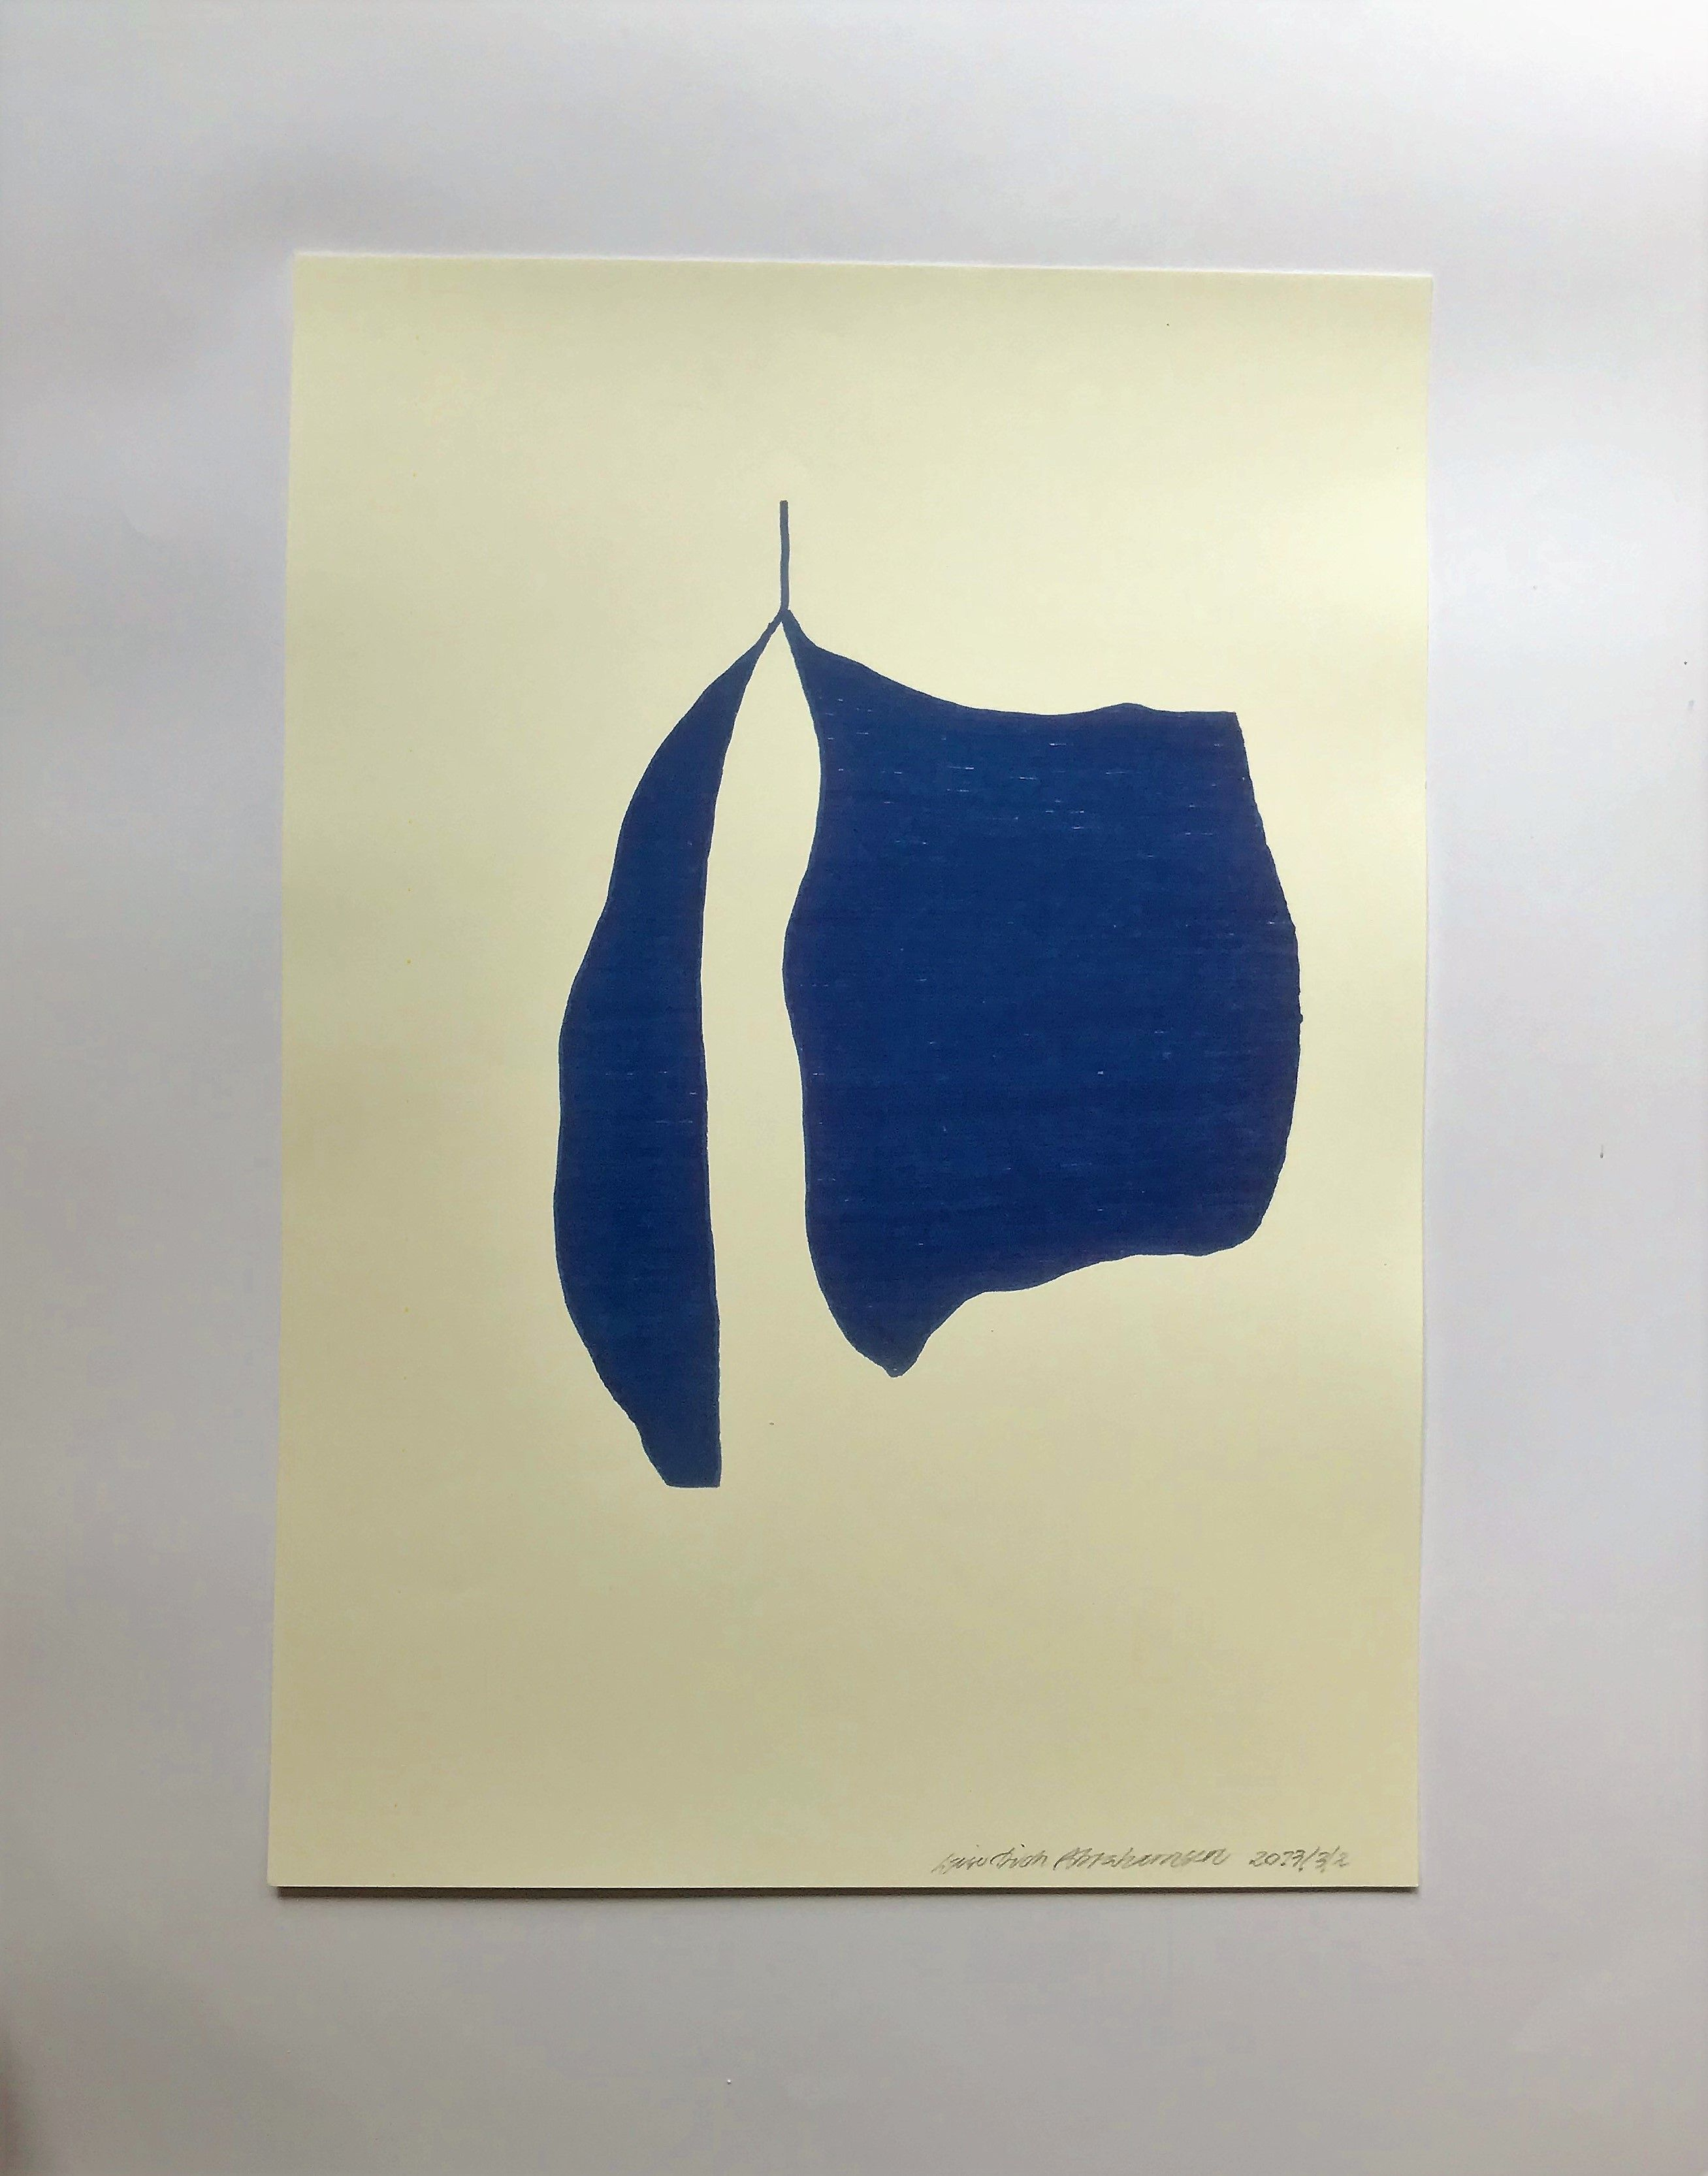 Leise Dich Abrahamsen 8211 Blue Note A3